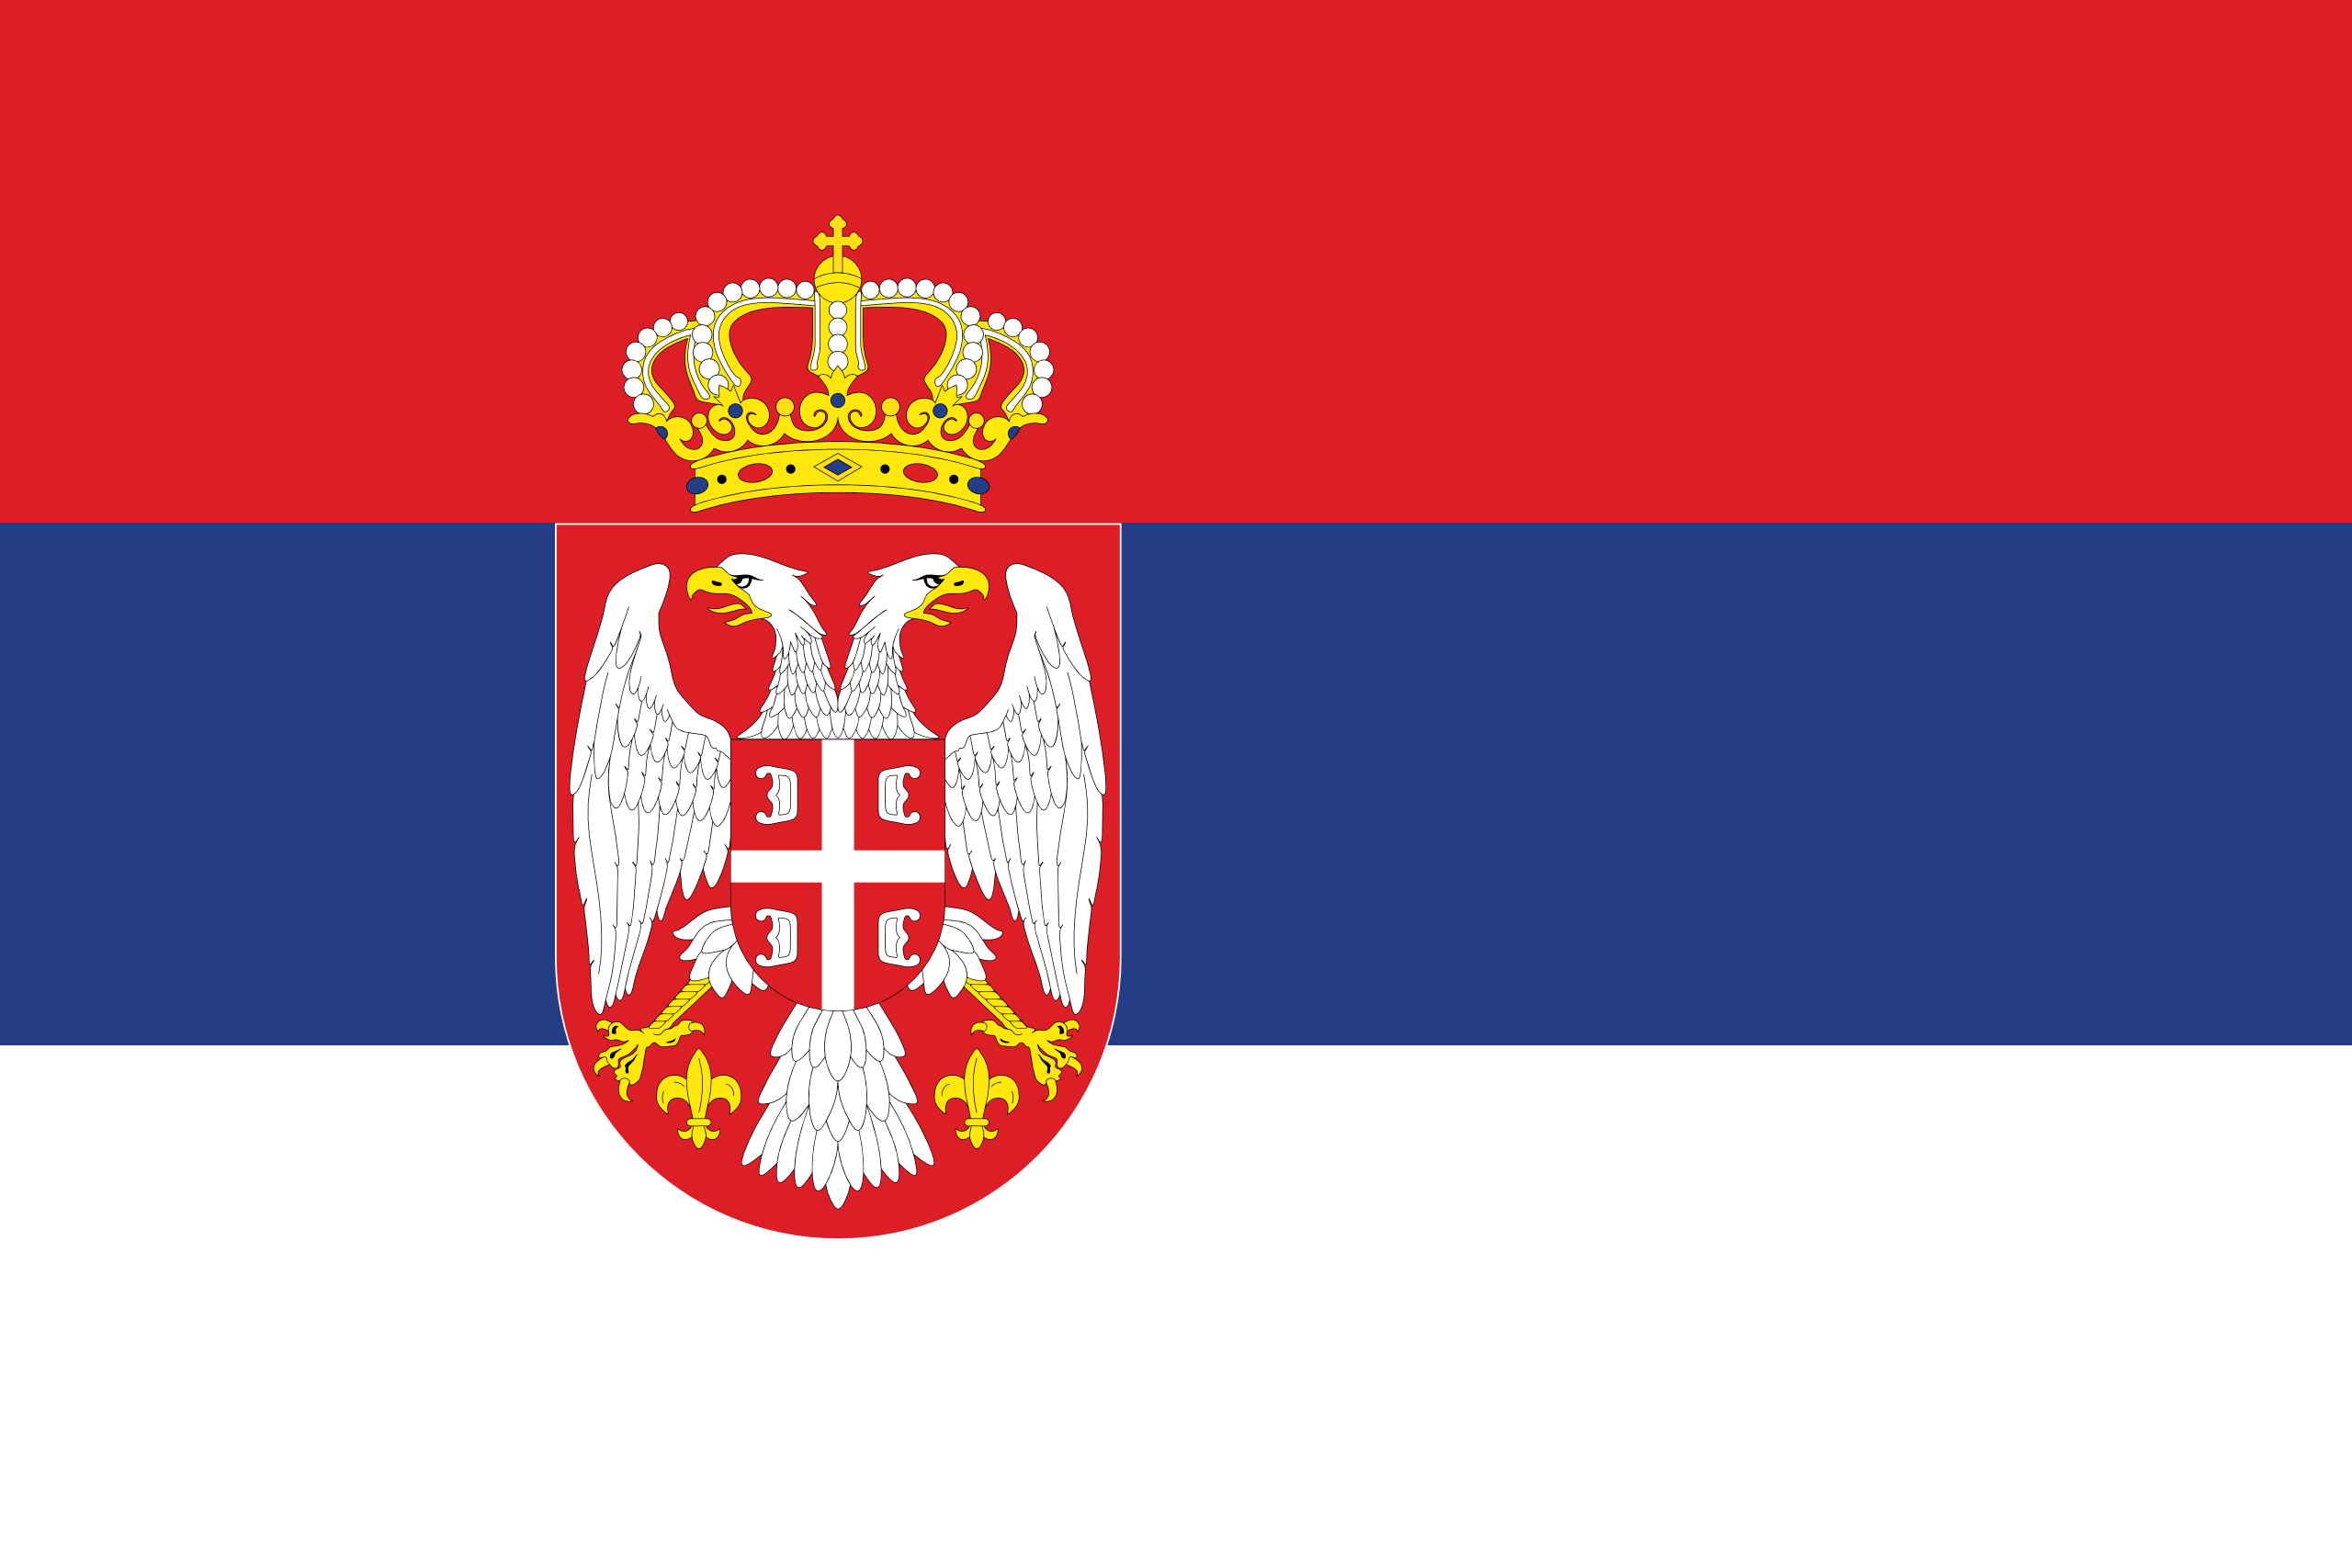 serbia, страна, Эмблема, логотип, символ - Обои HD - Профессор falken.com